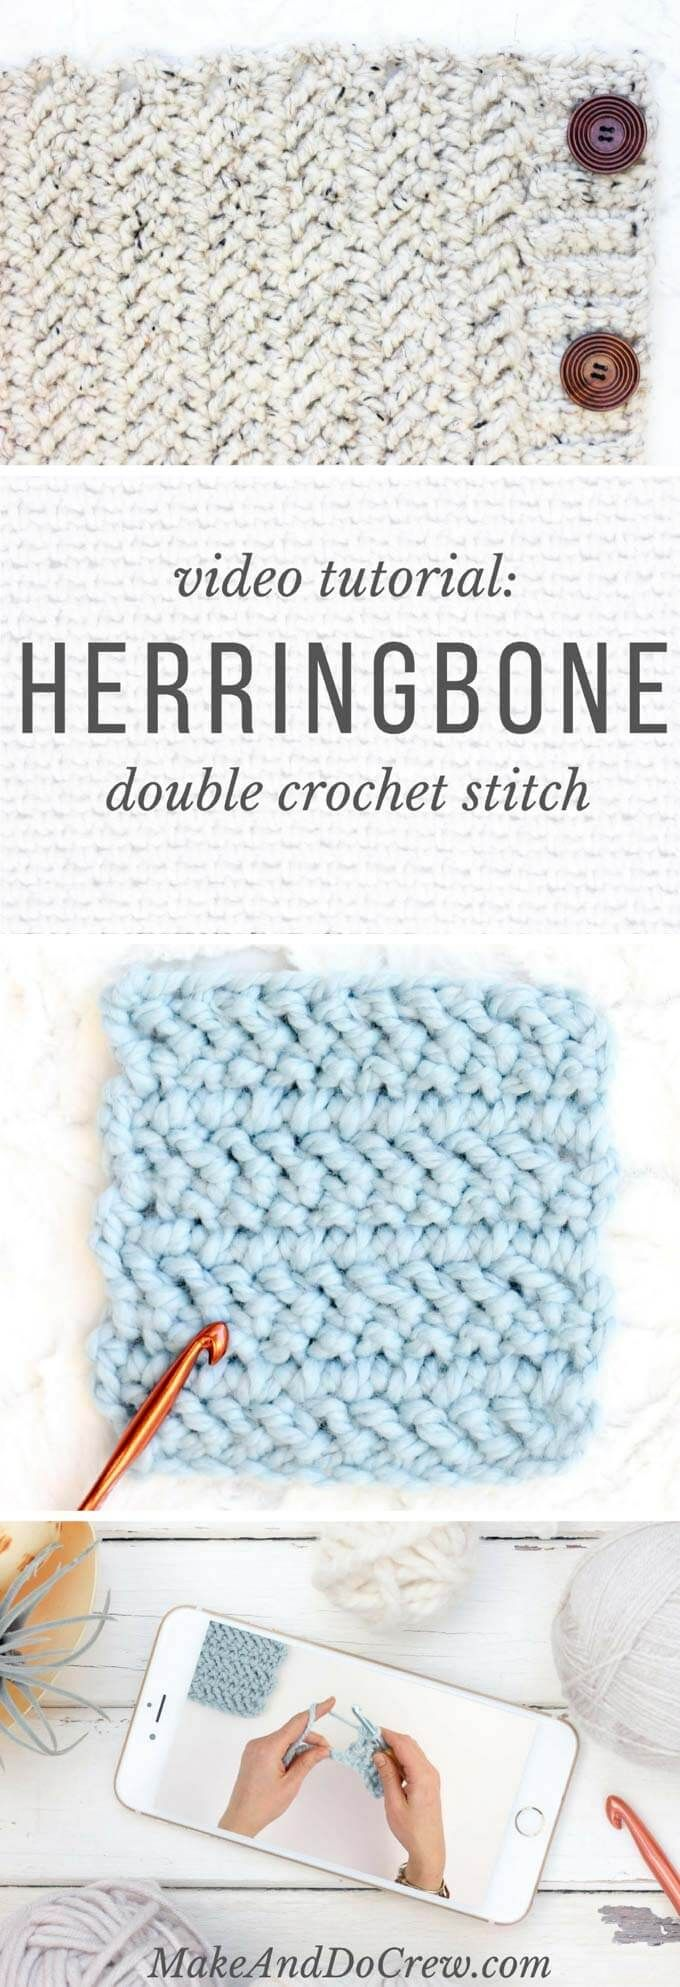 Video: How to Crochet the Herringbone Double Crochet Stitch ...